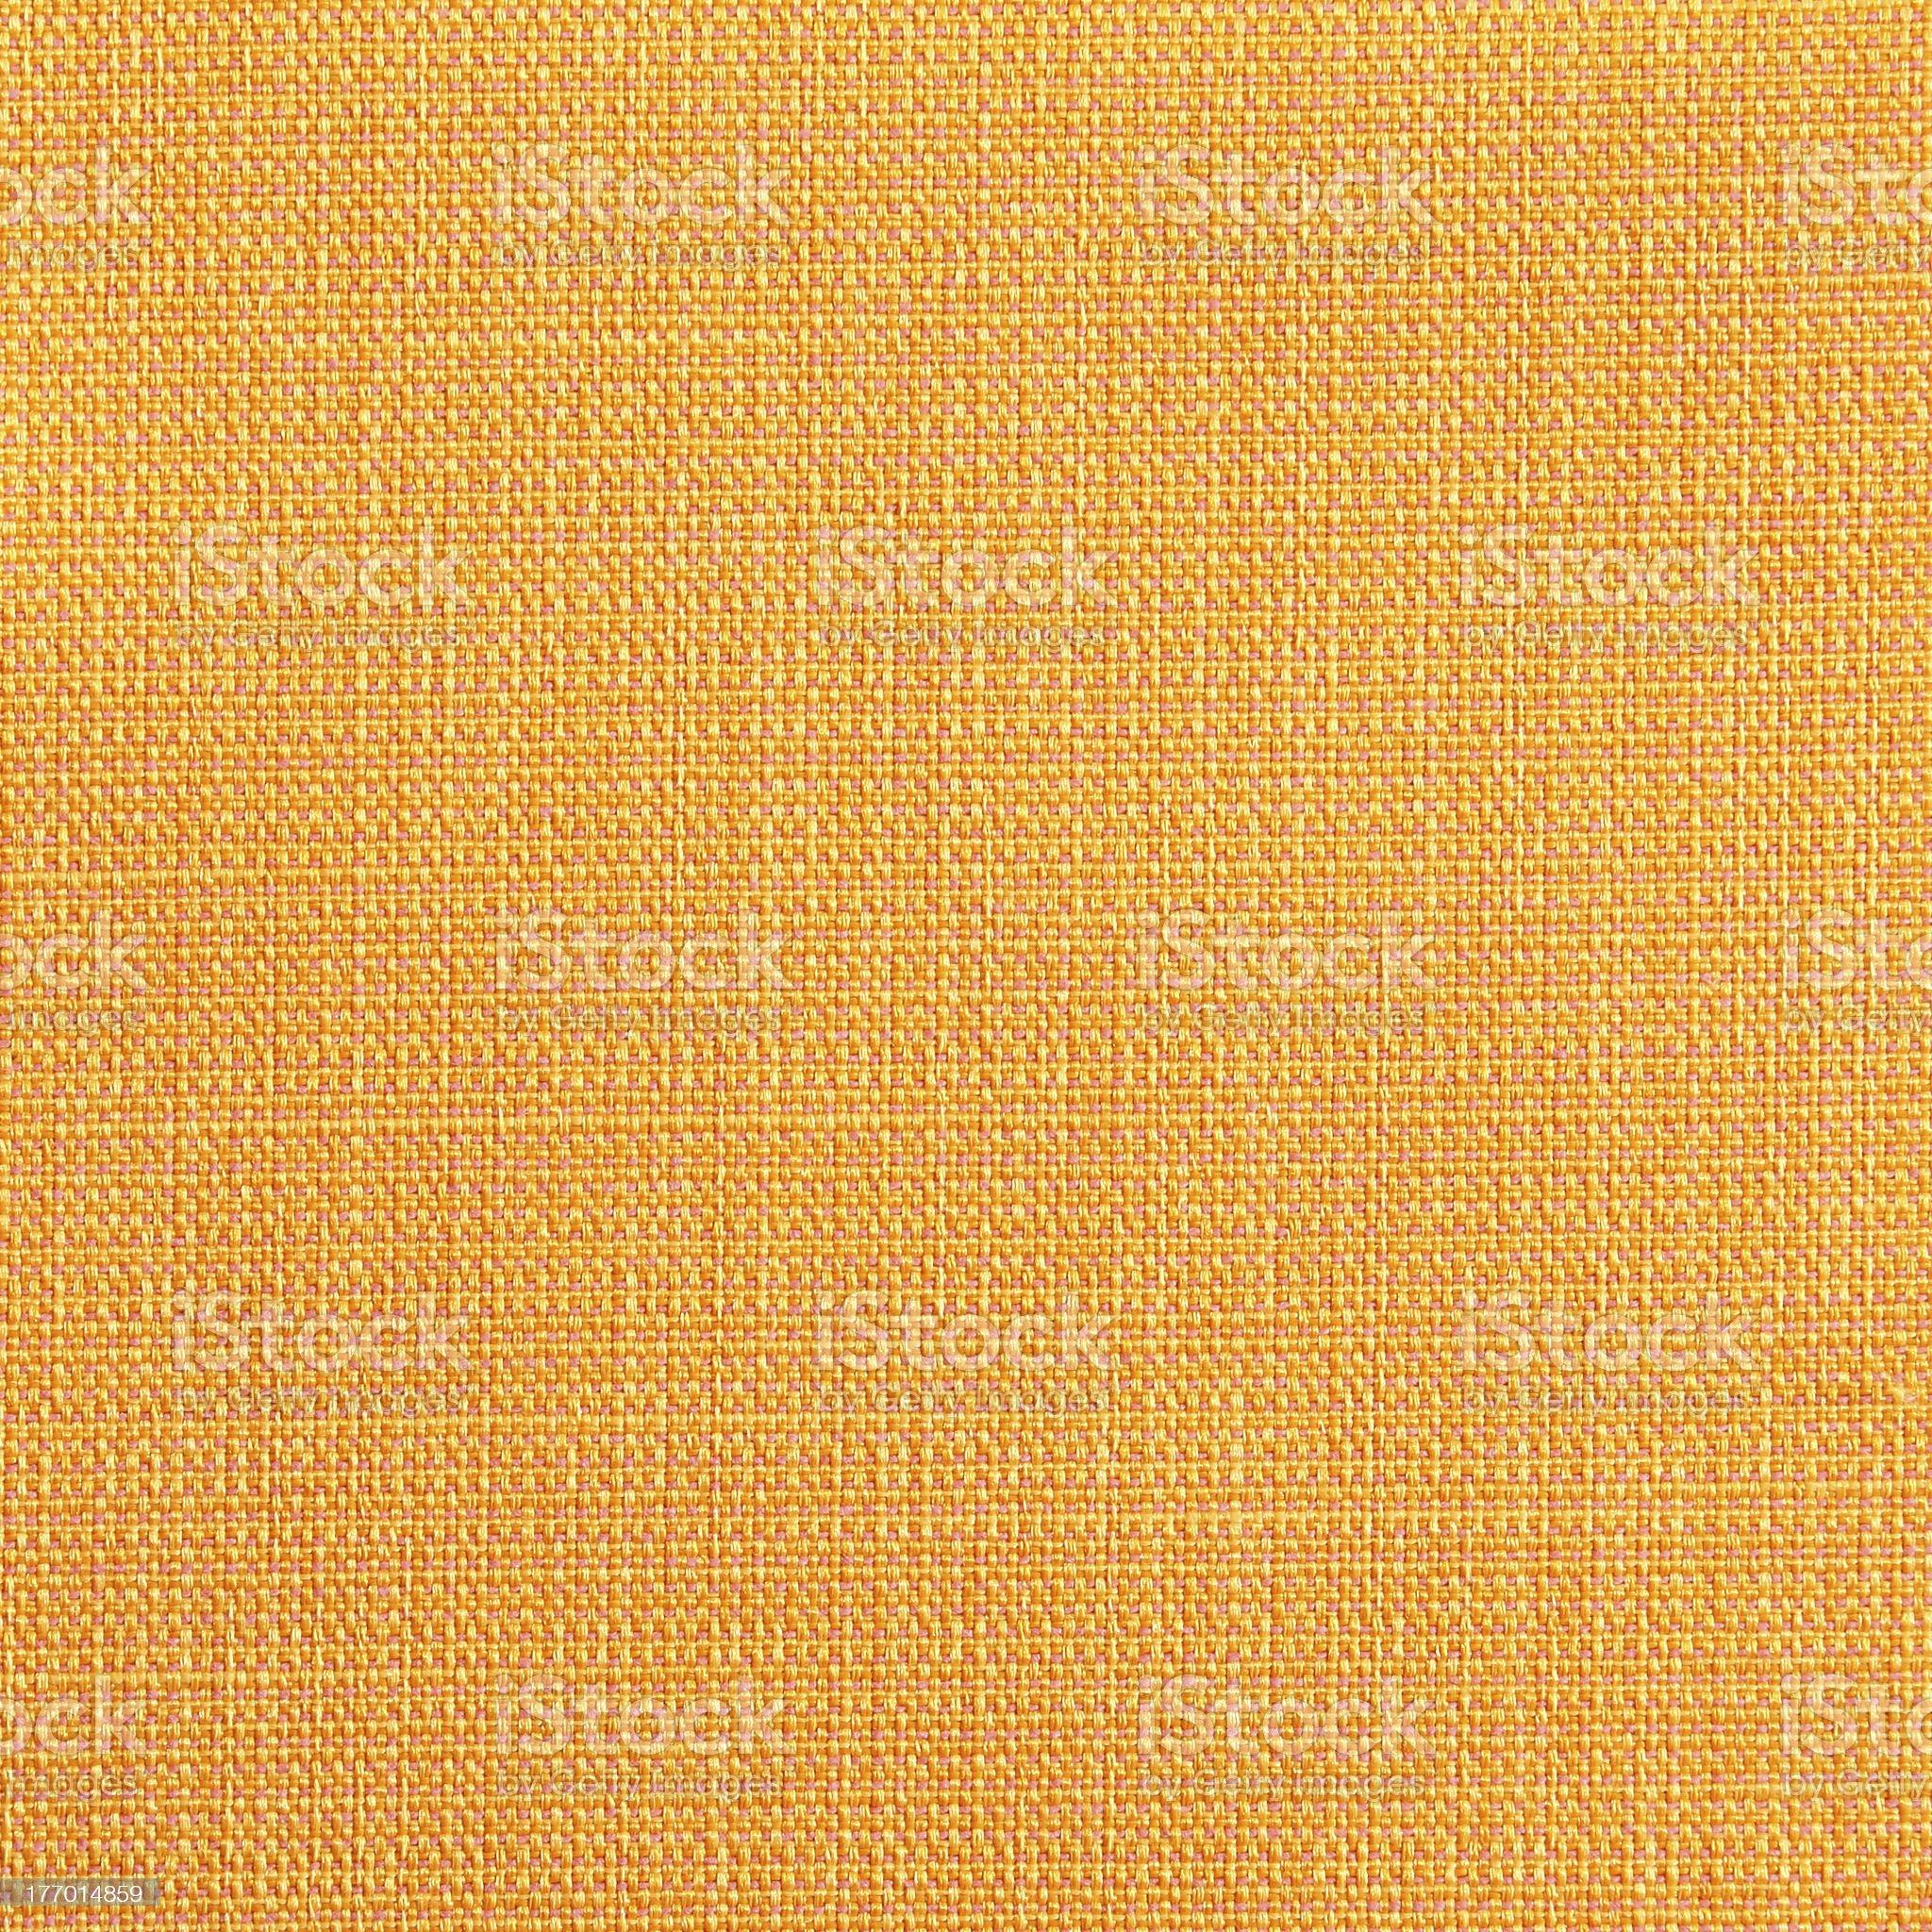 Yellow linen canvas texture royalty-free stock photo